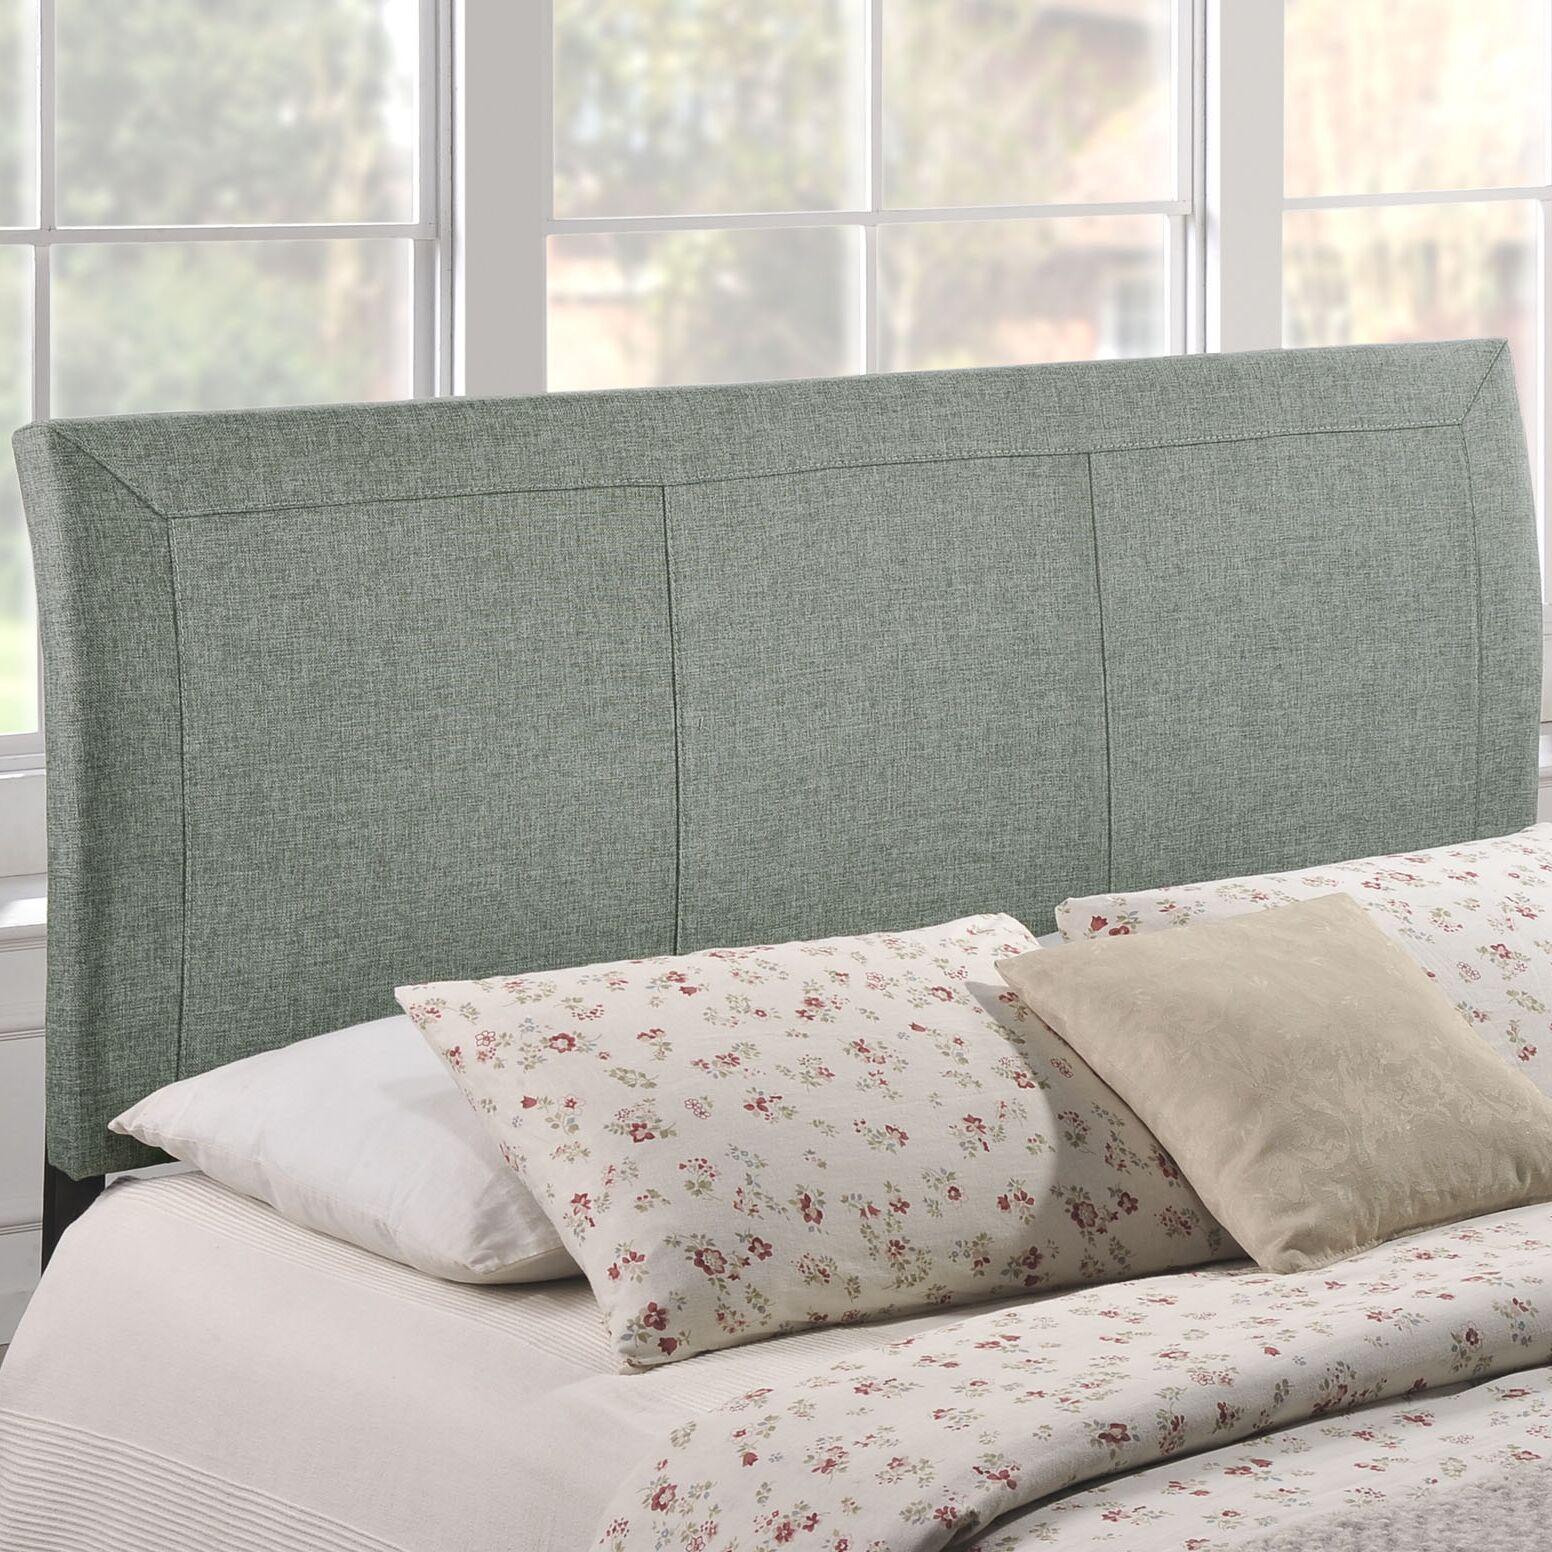 Viveiros Queen Upholstered Sleigh Headboard Upholstery: Gray